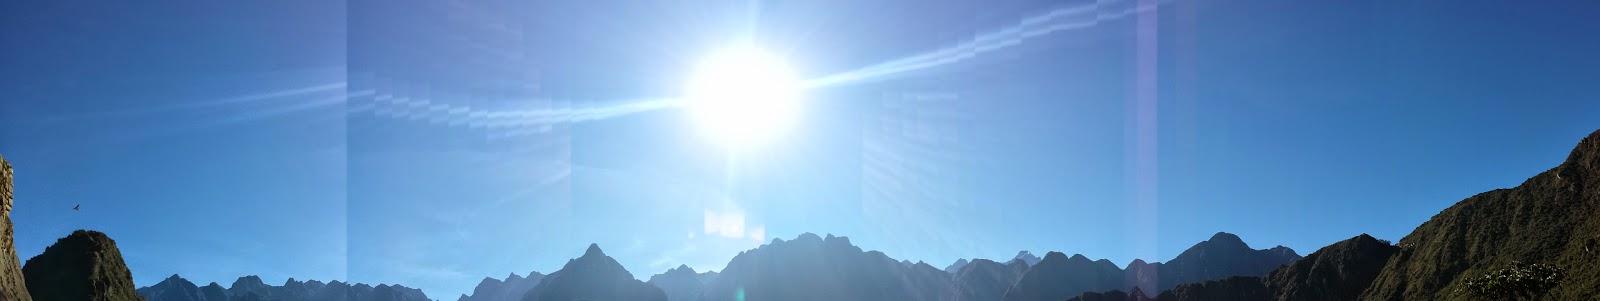 Amanecer, Montañas